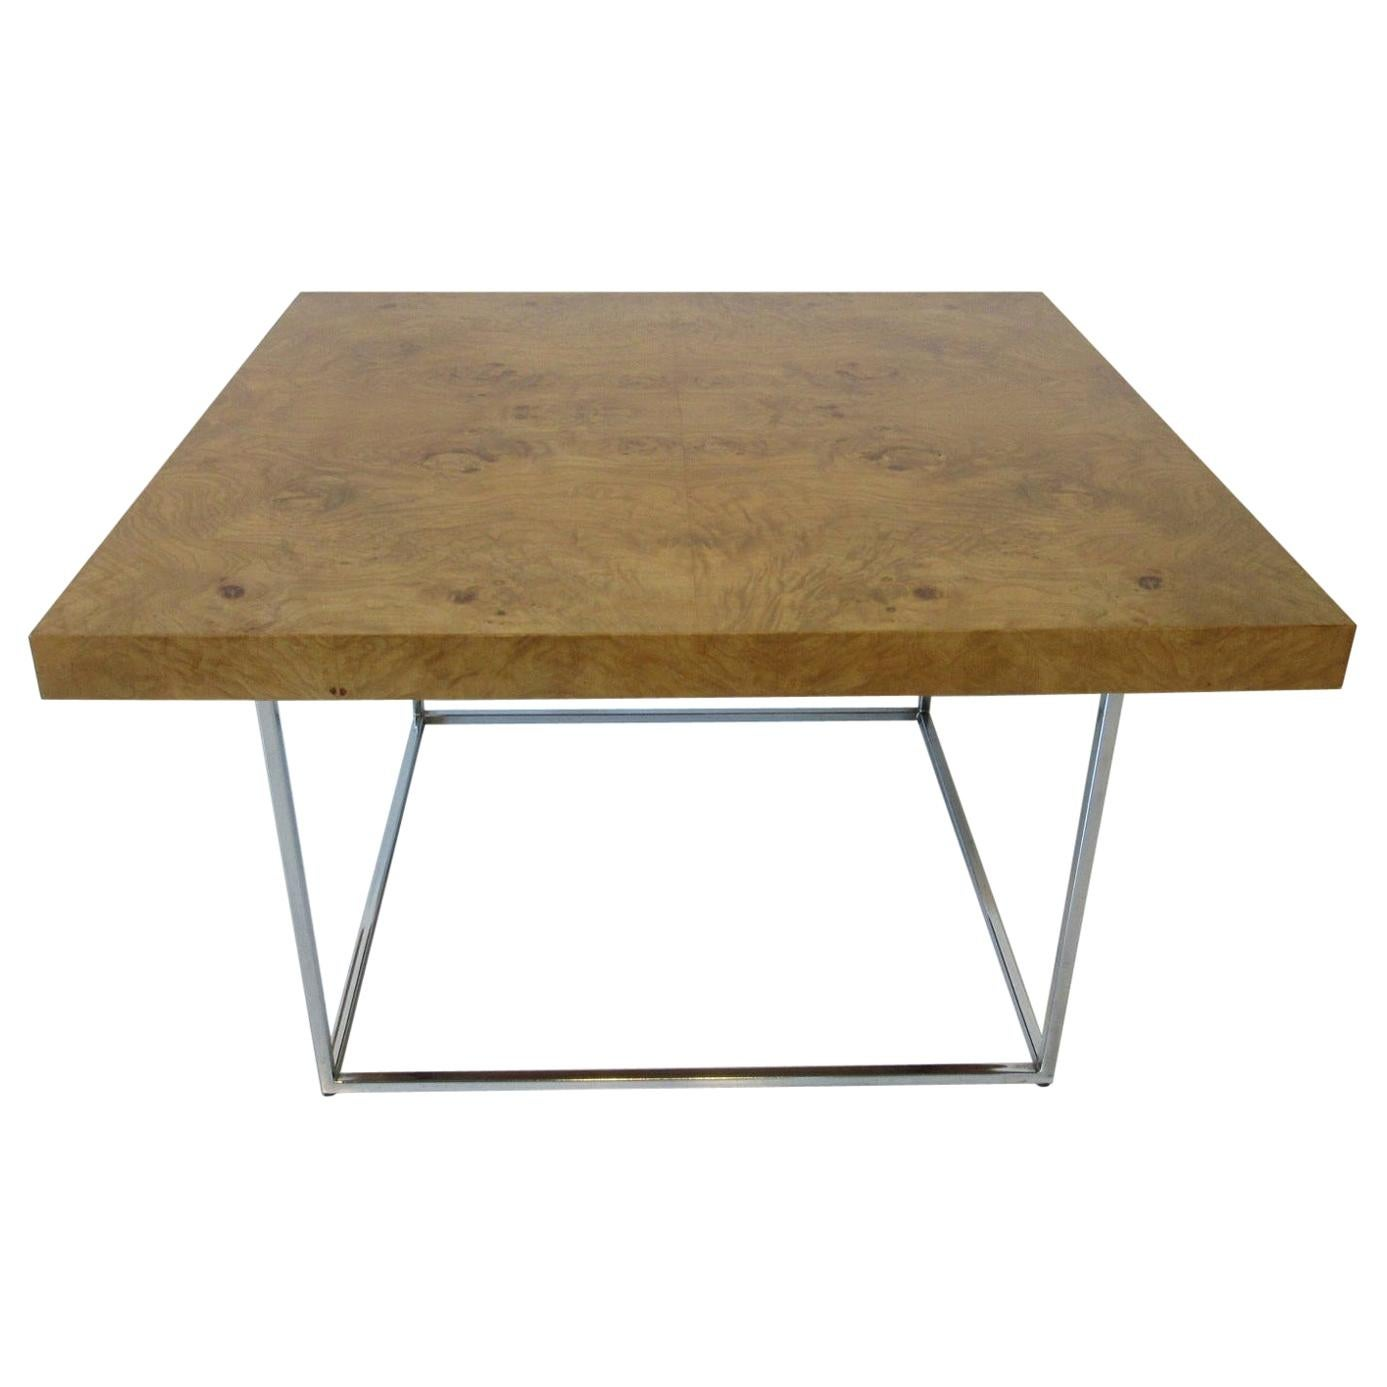 Milo Baughman Styled Burl Coffee Table